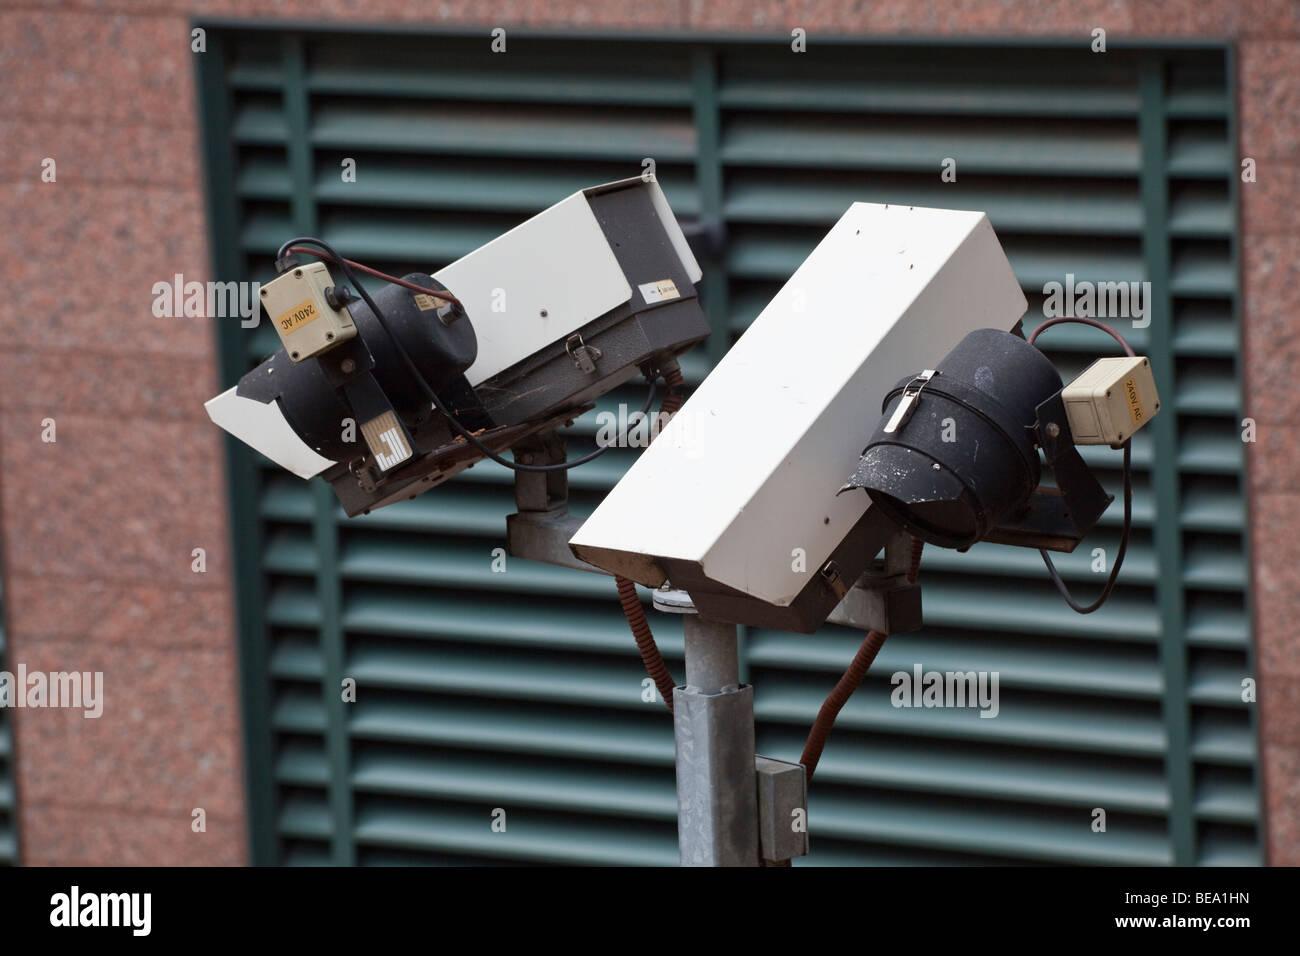 closed circuit tv camera, London Underground, London, England UK - Stock Image